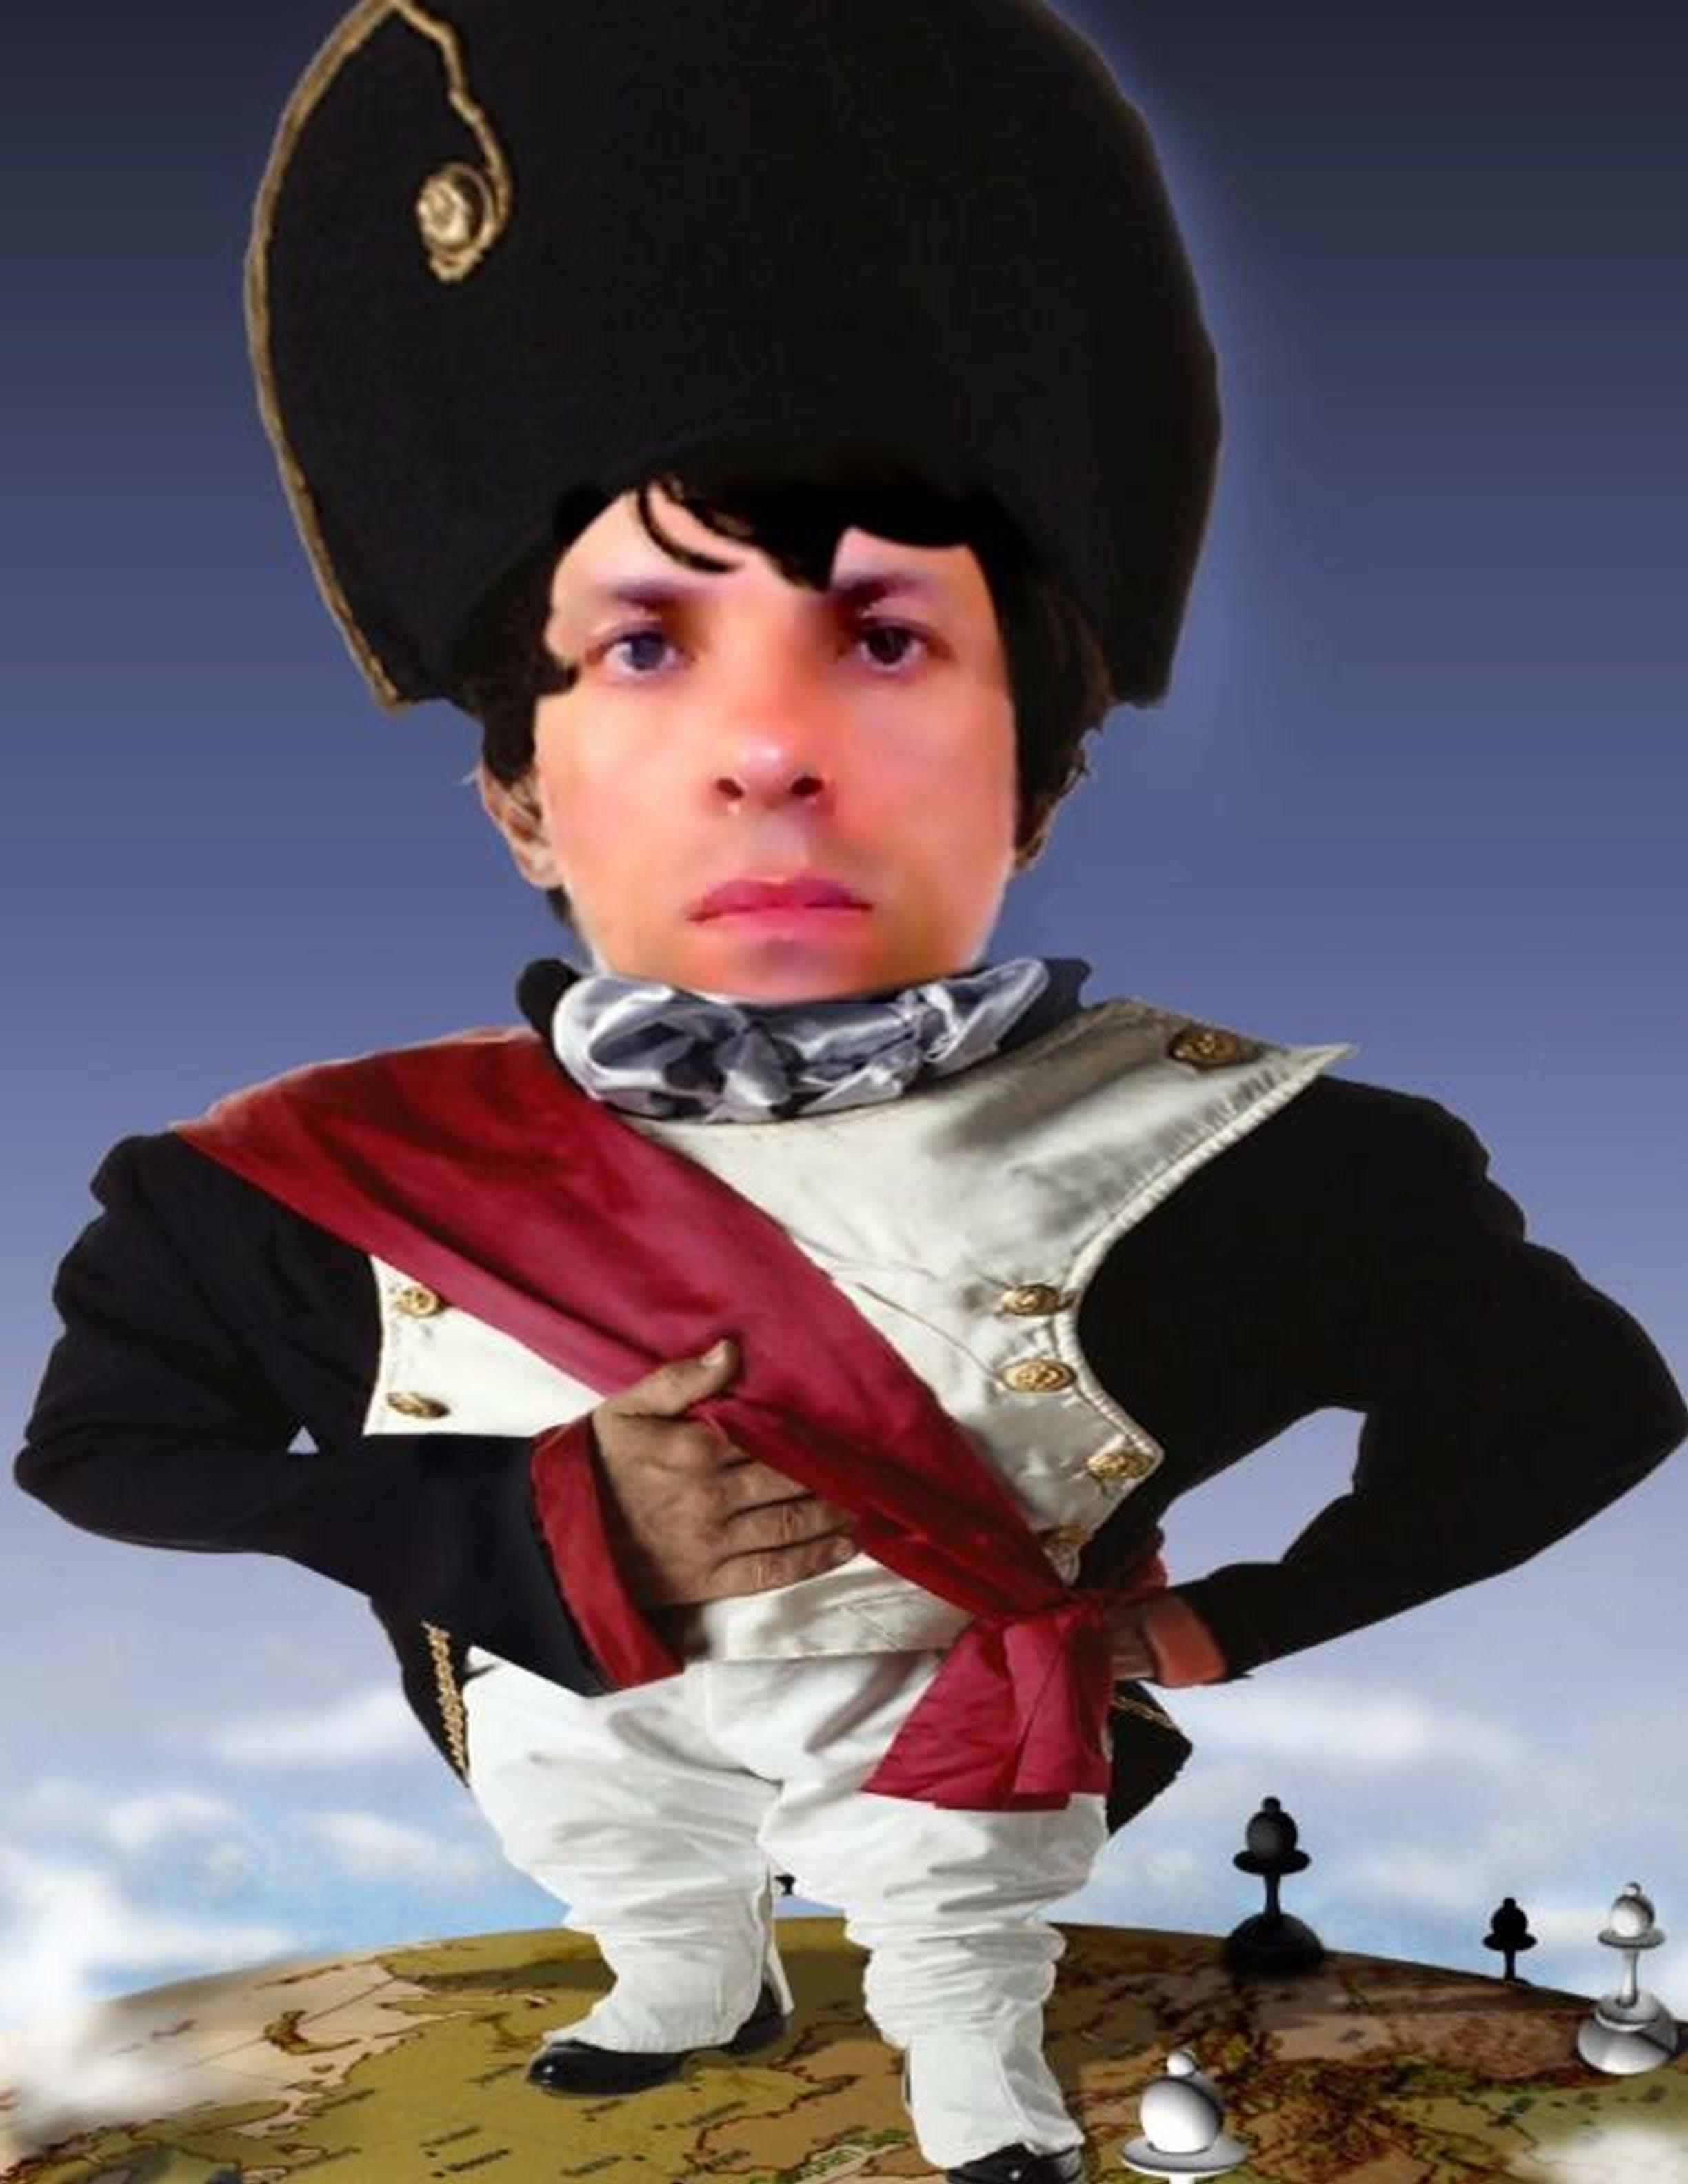 Free stock photo of Napoleon Bonaparte